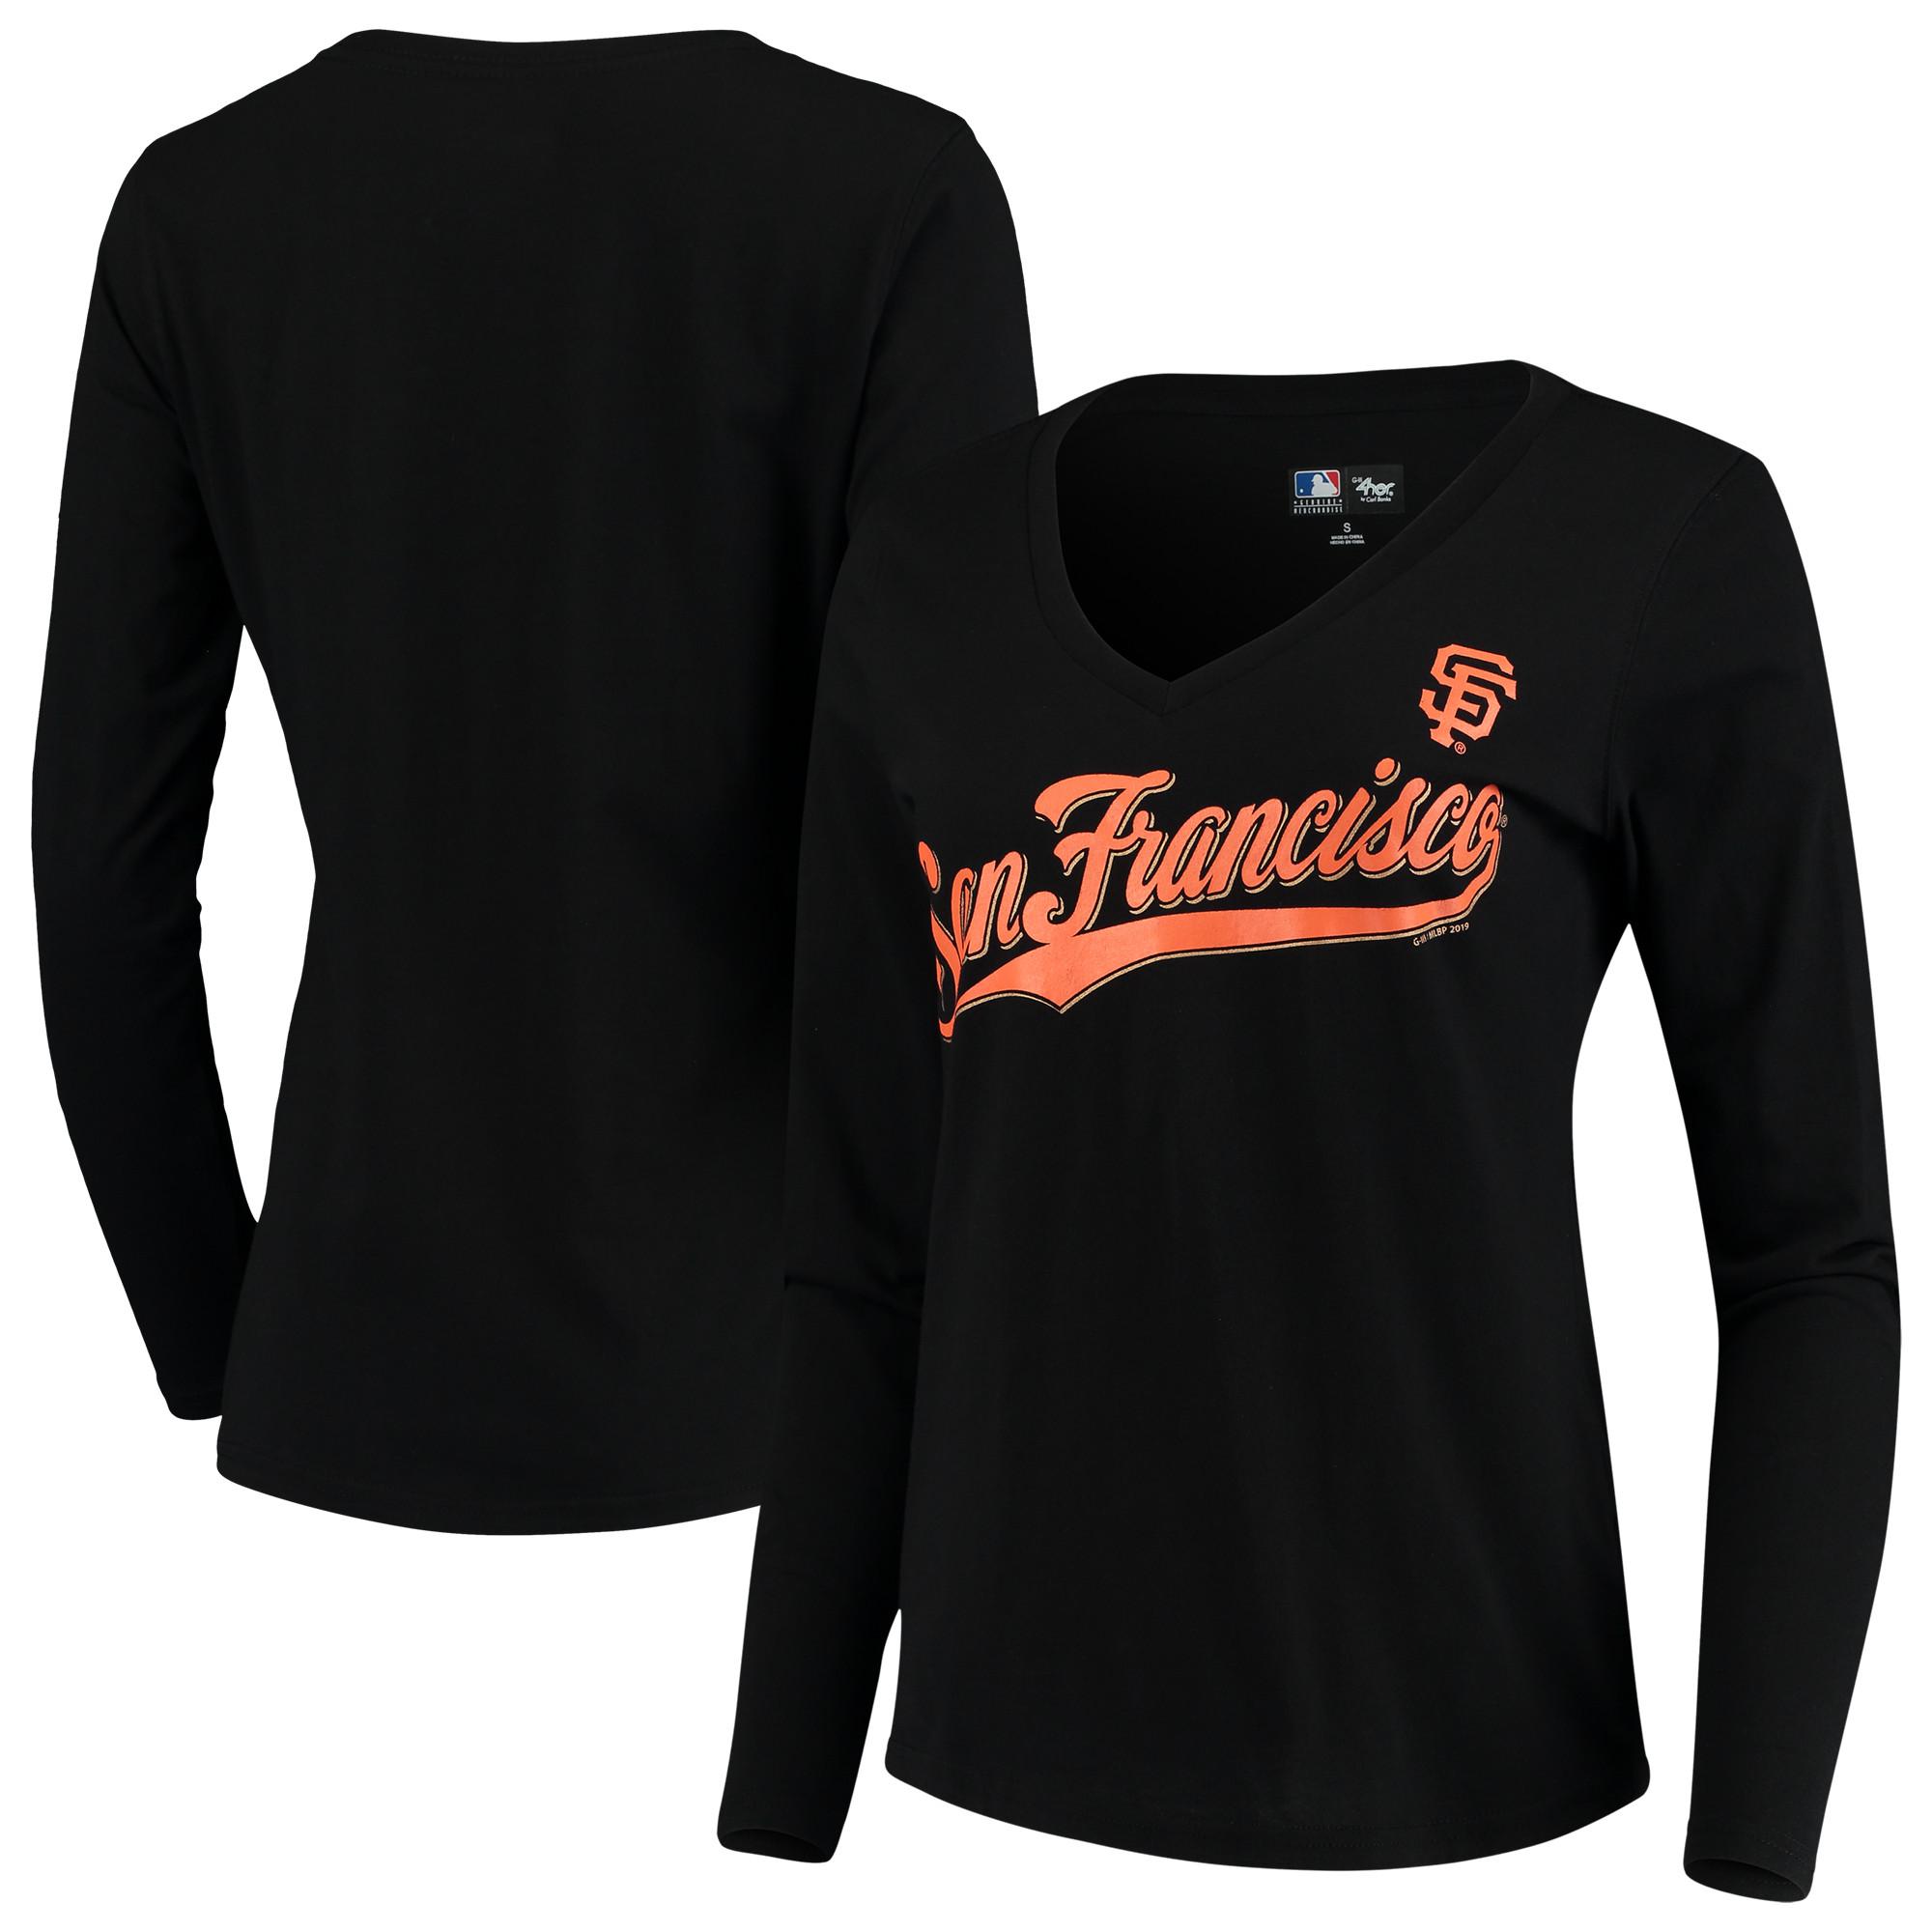 San Francisco Giants G-III 4Her by Carl Banks Women's Post Season Long Sleeve T-Shirt - Black